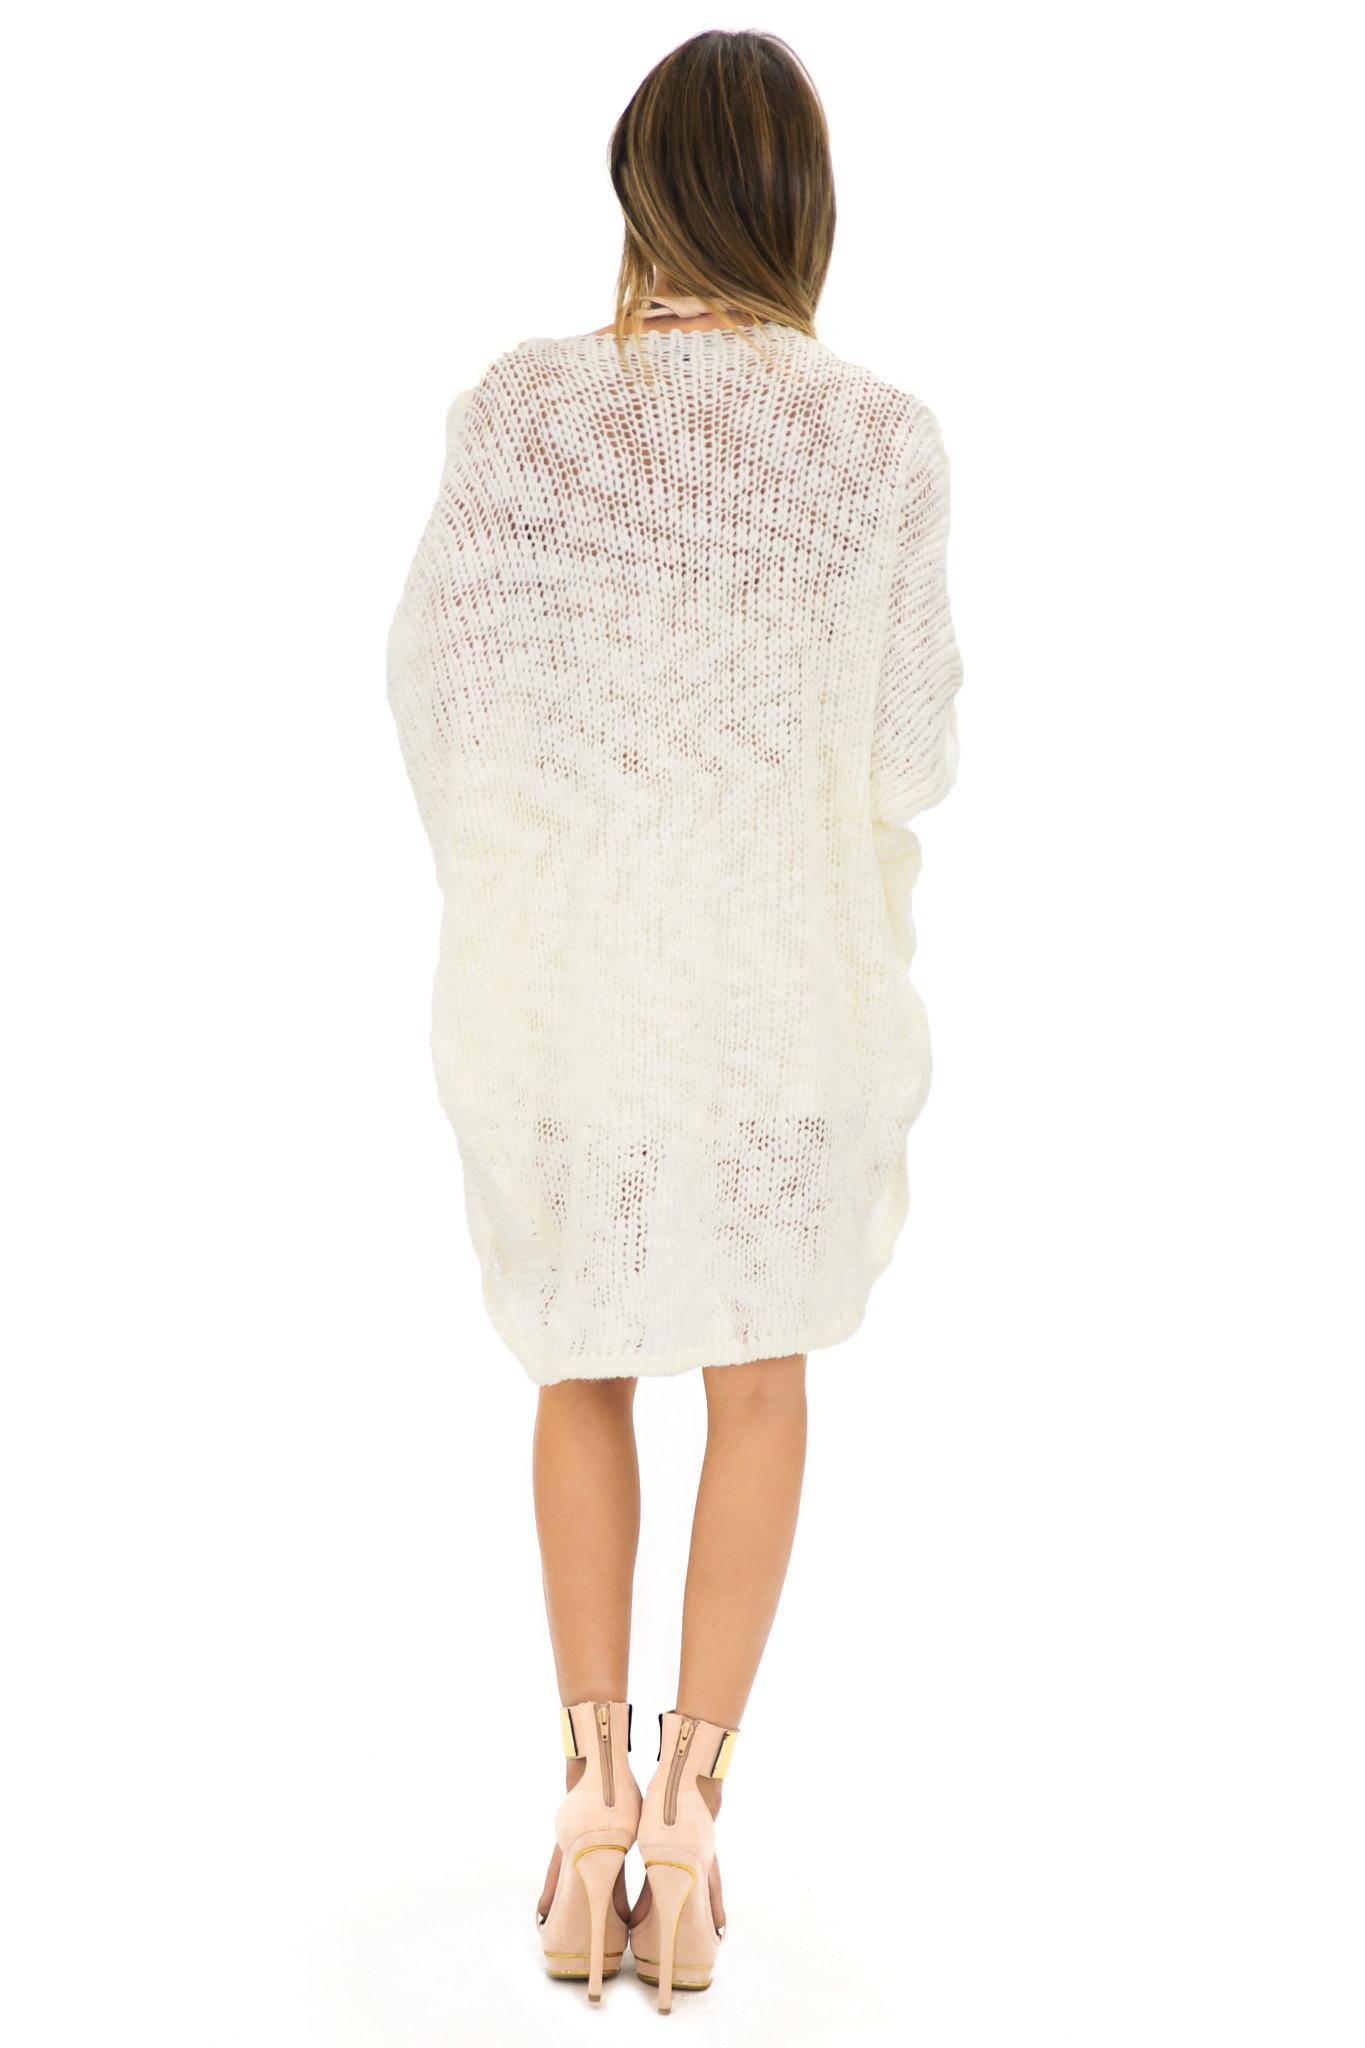 Vern knit draped cardigan